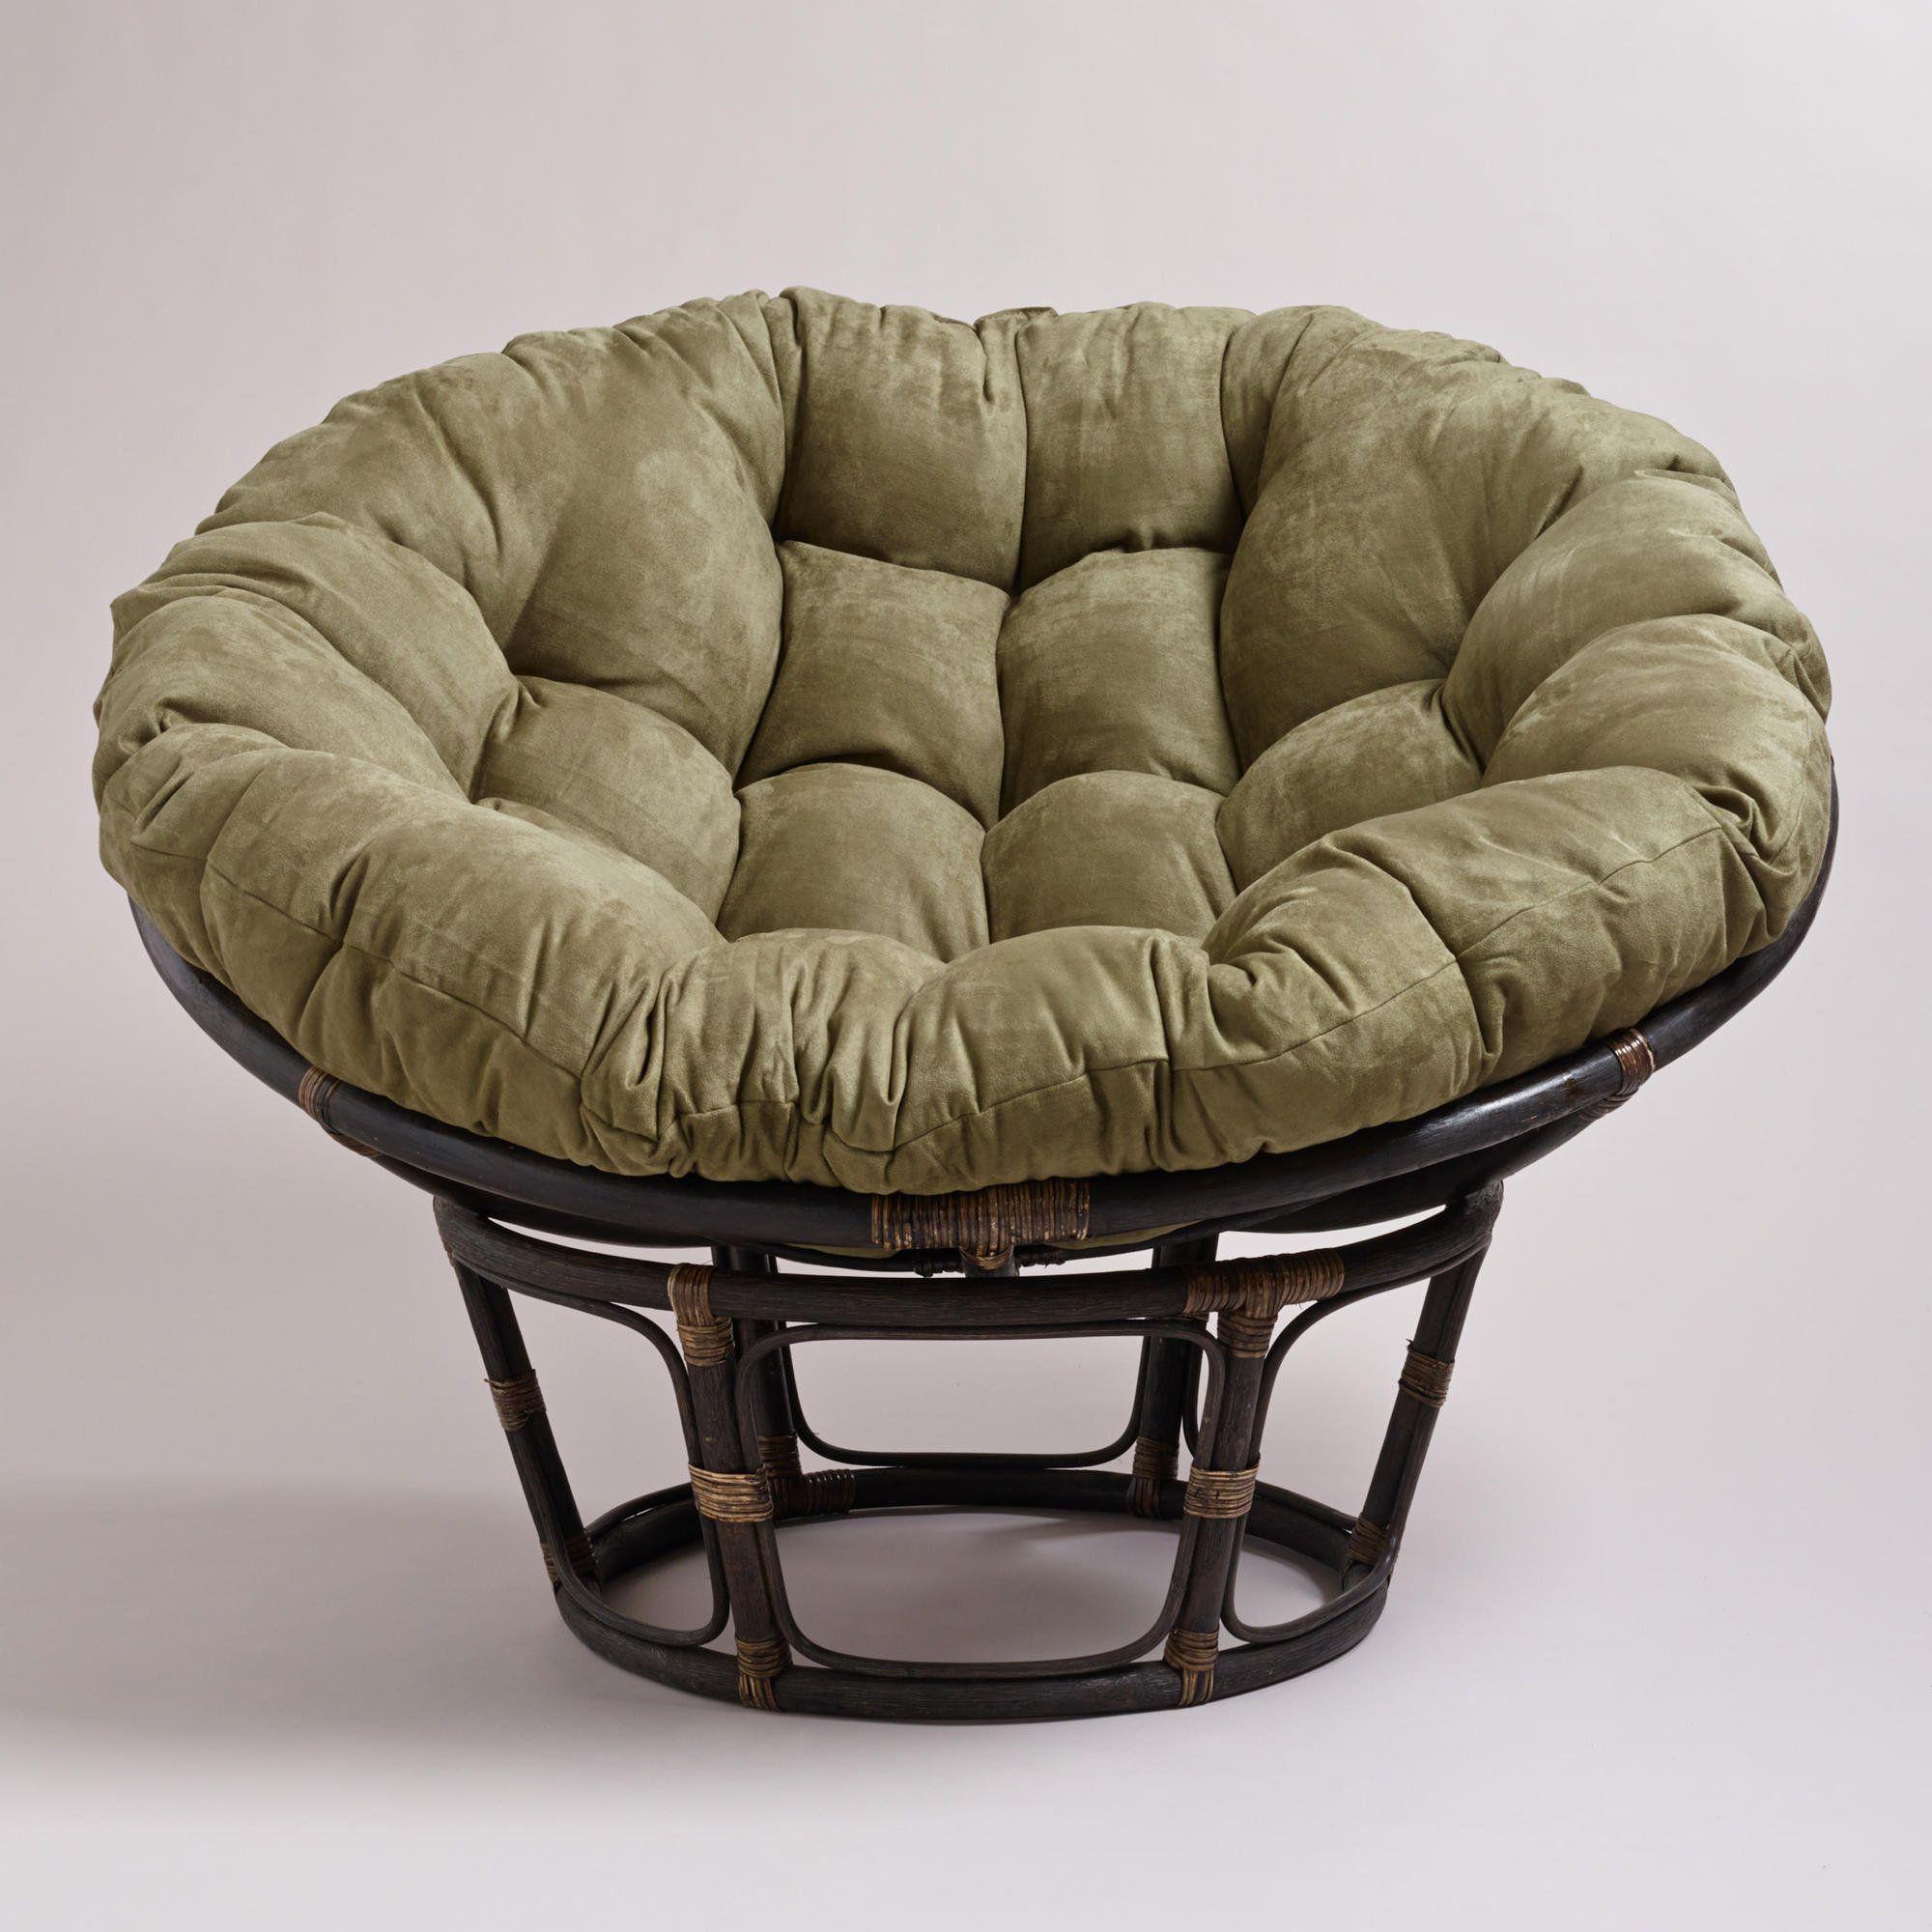 olive microsuede papasan chair cushion for jillian xo pinterest papasan chair. Black Bedroom Furniture Sets. Home Design Ideas